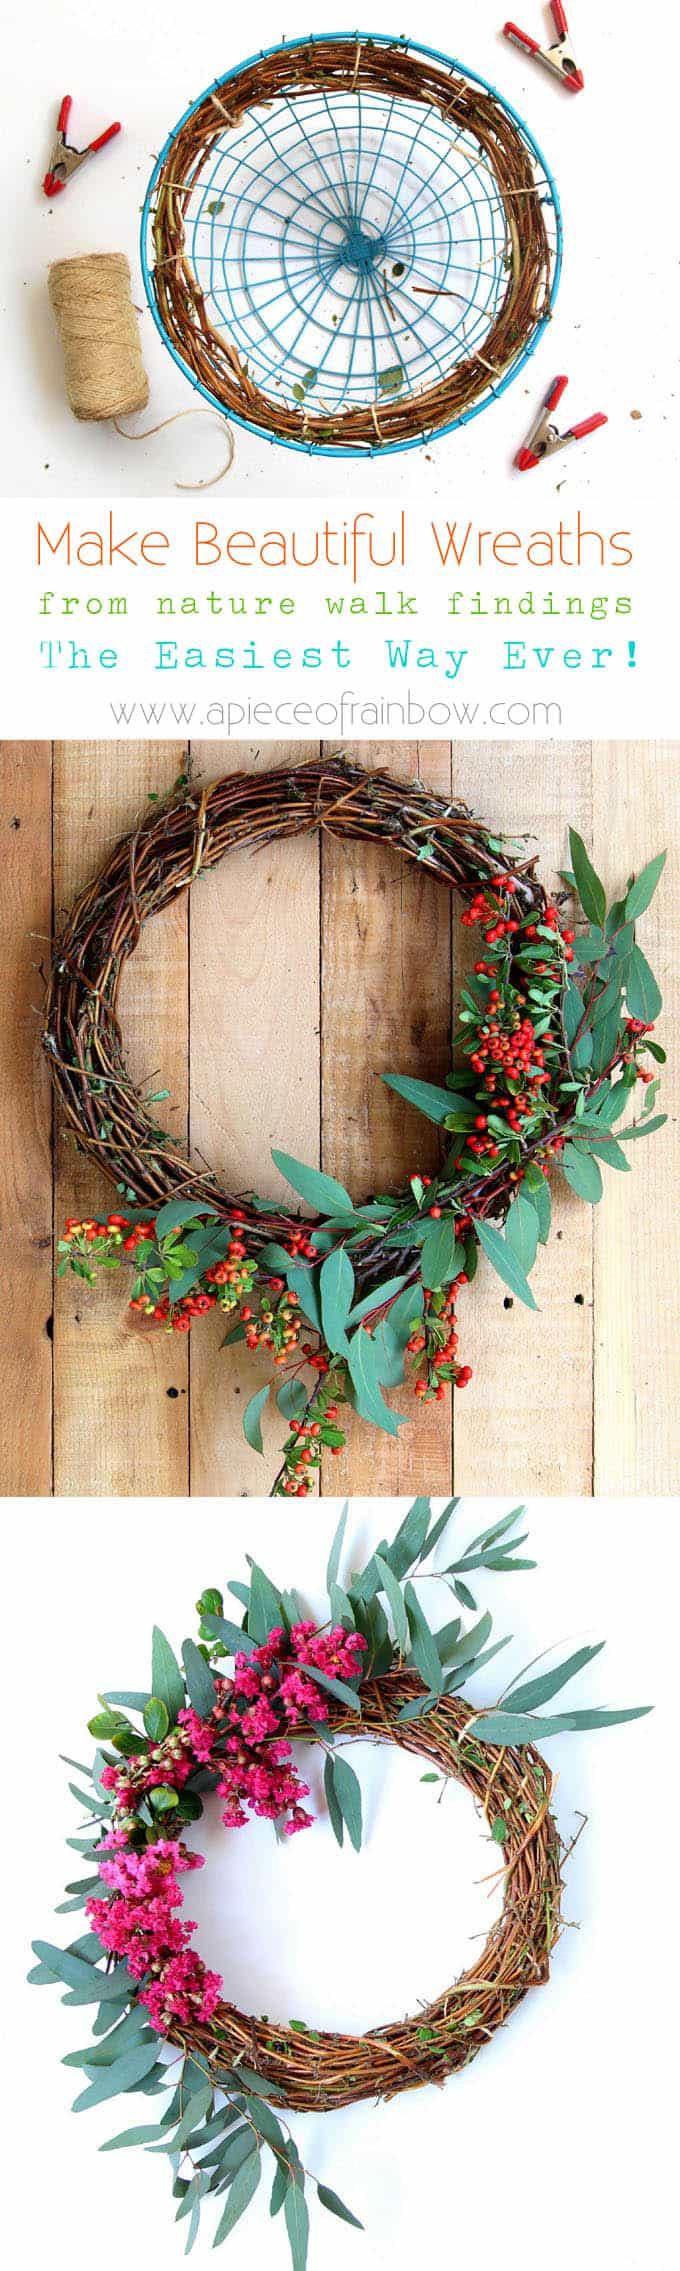 make-wreath-from-nature-walk-apieceofrainbow